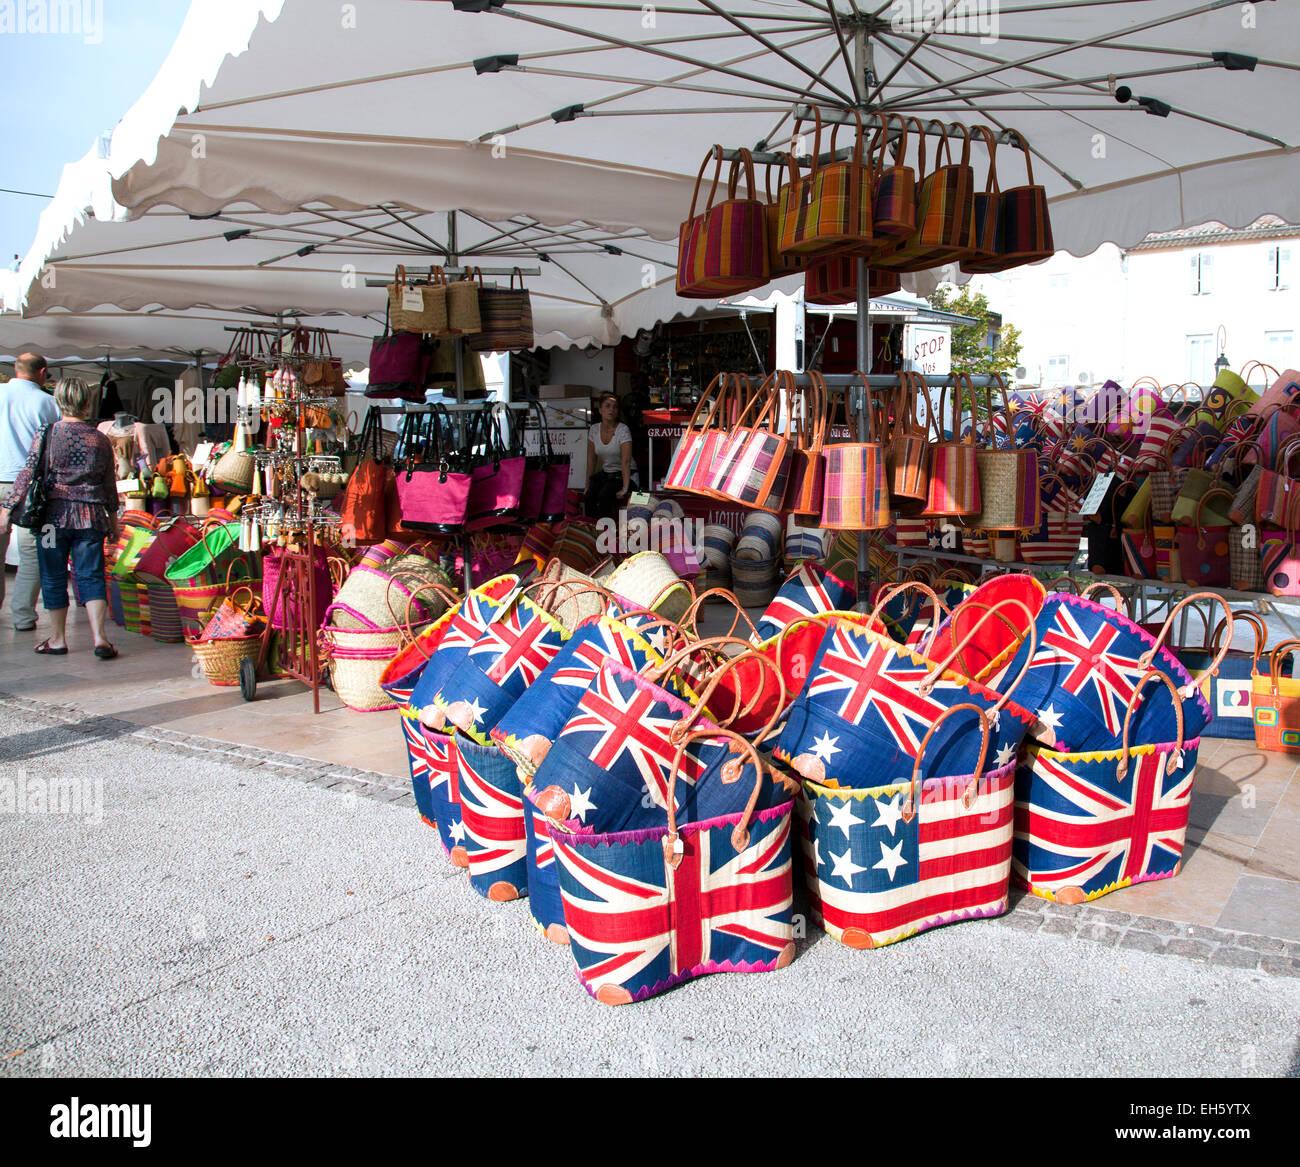 sunday flea market stockfotos sunday flea market bilder alamy. Black Bedroom Furniture Sets. Home Design Ideas